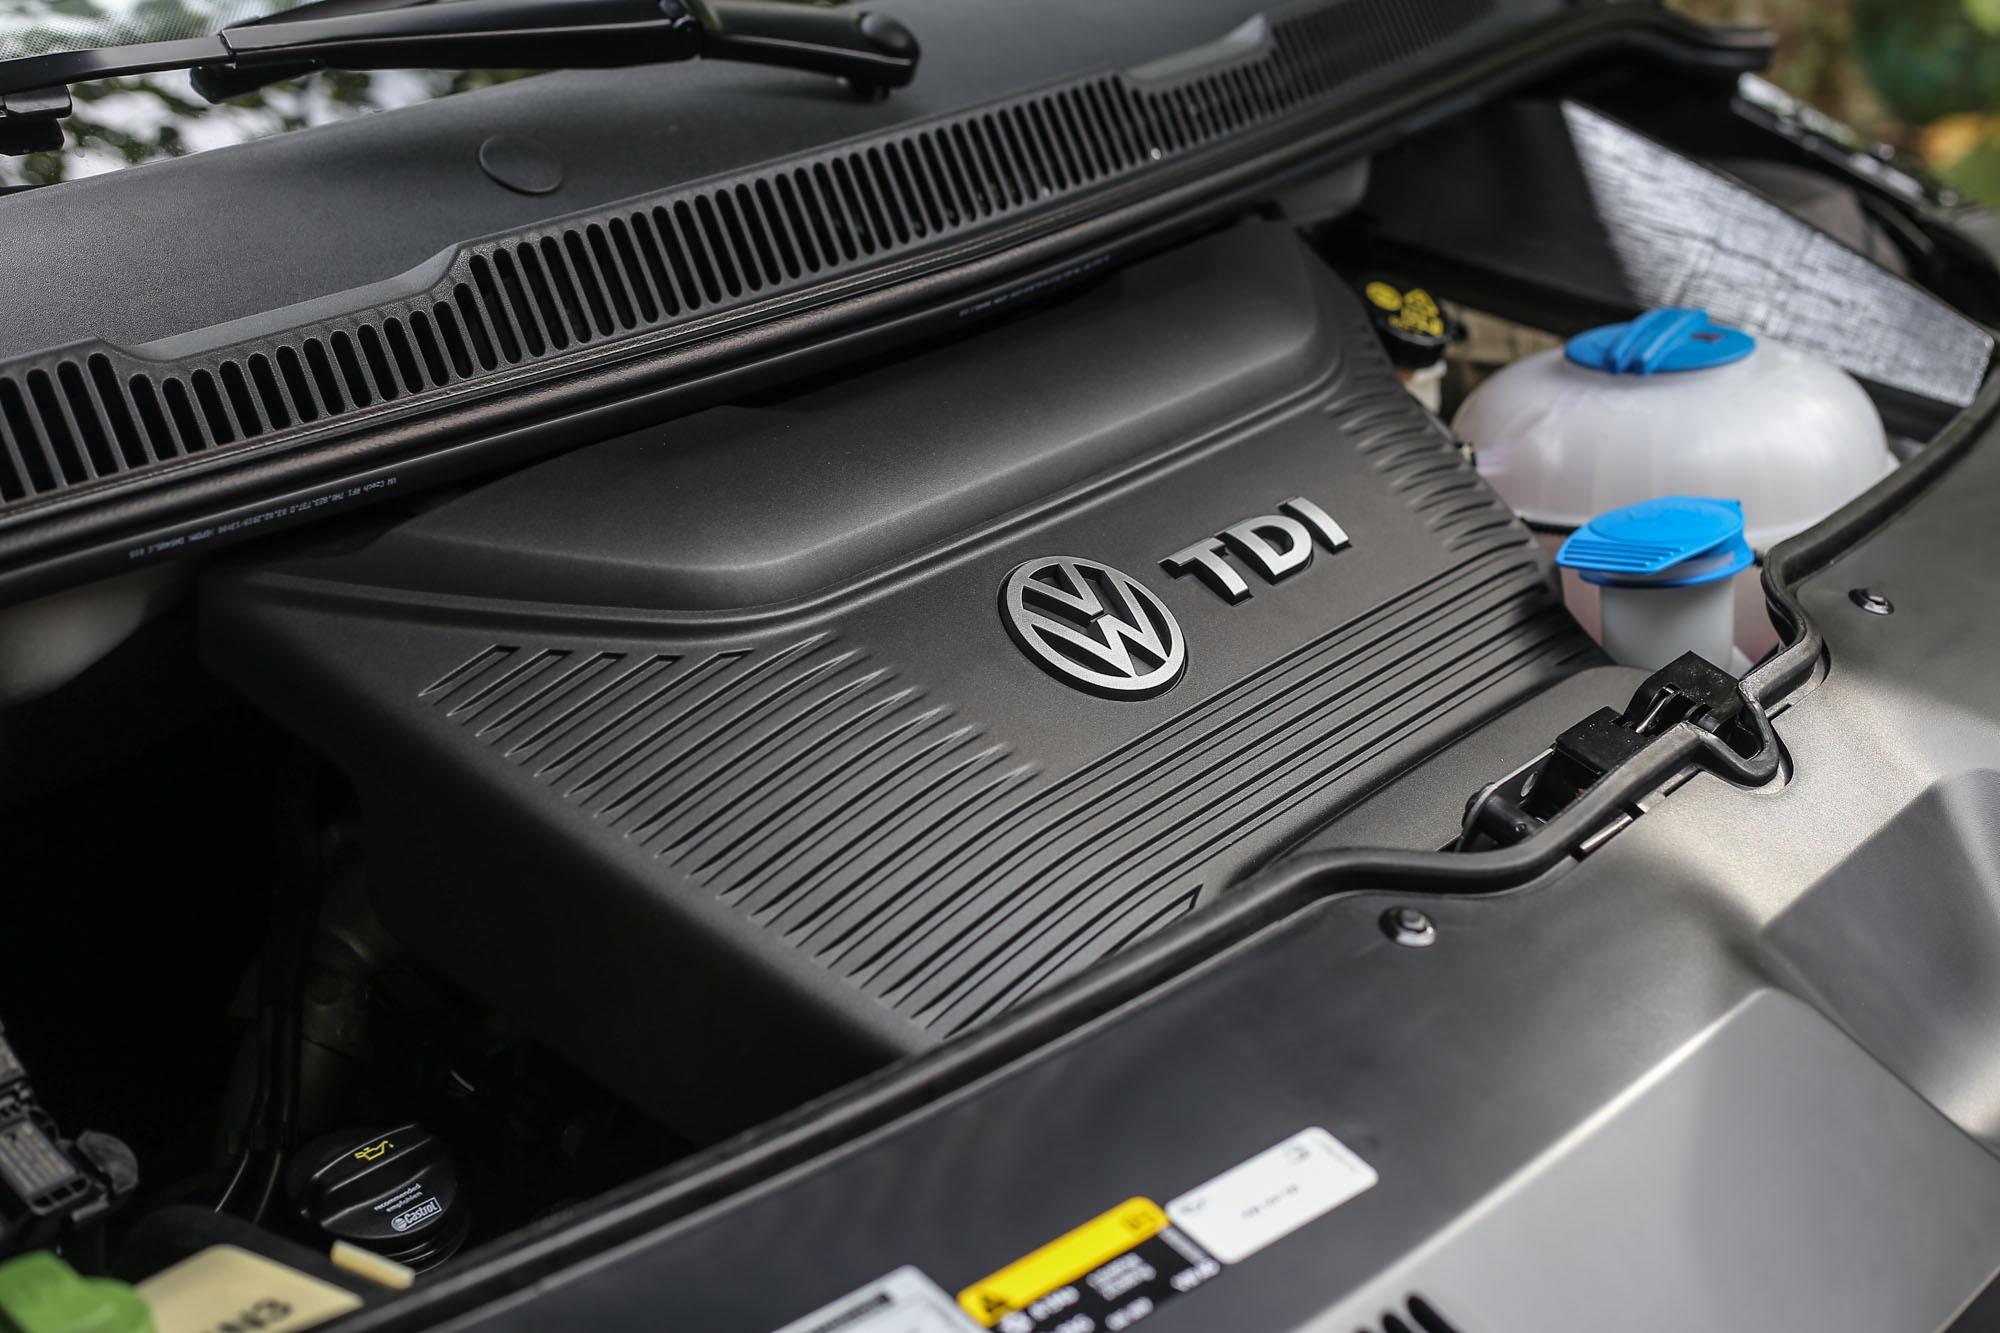 Multivan 車系皆搭載 2.0TDI 柴油引擎,具備 199ps/3800~4000rpm 最大馬力與 45.9khm/1400~2400rpm 峰值扭力輸出。